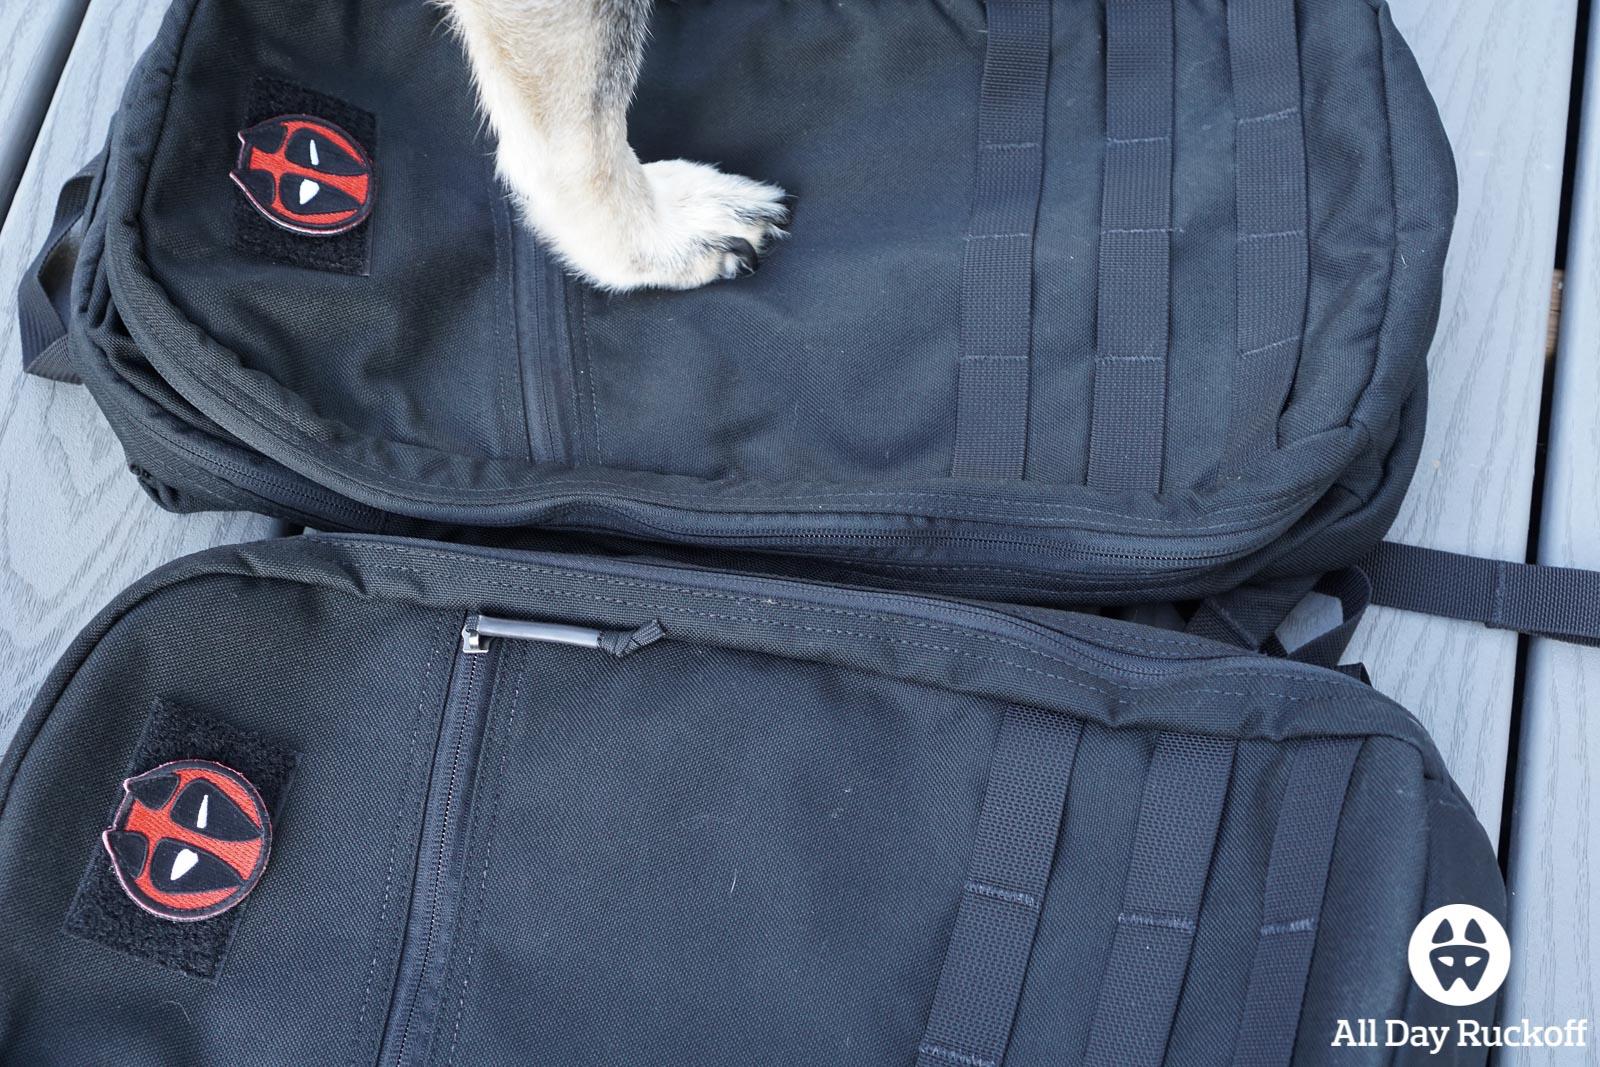 GORUCK Bullet Ruck 10L Comparison - Watson 3